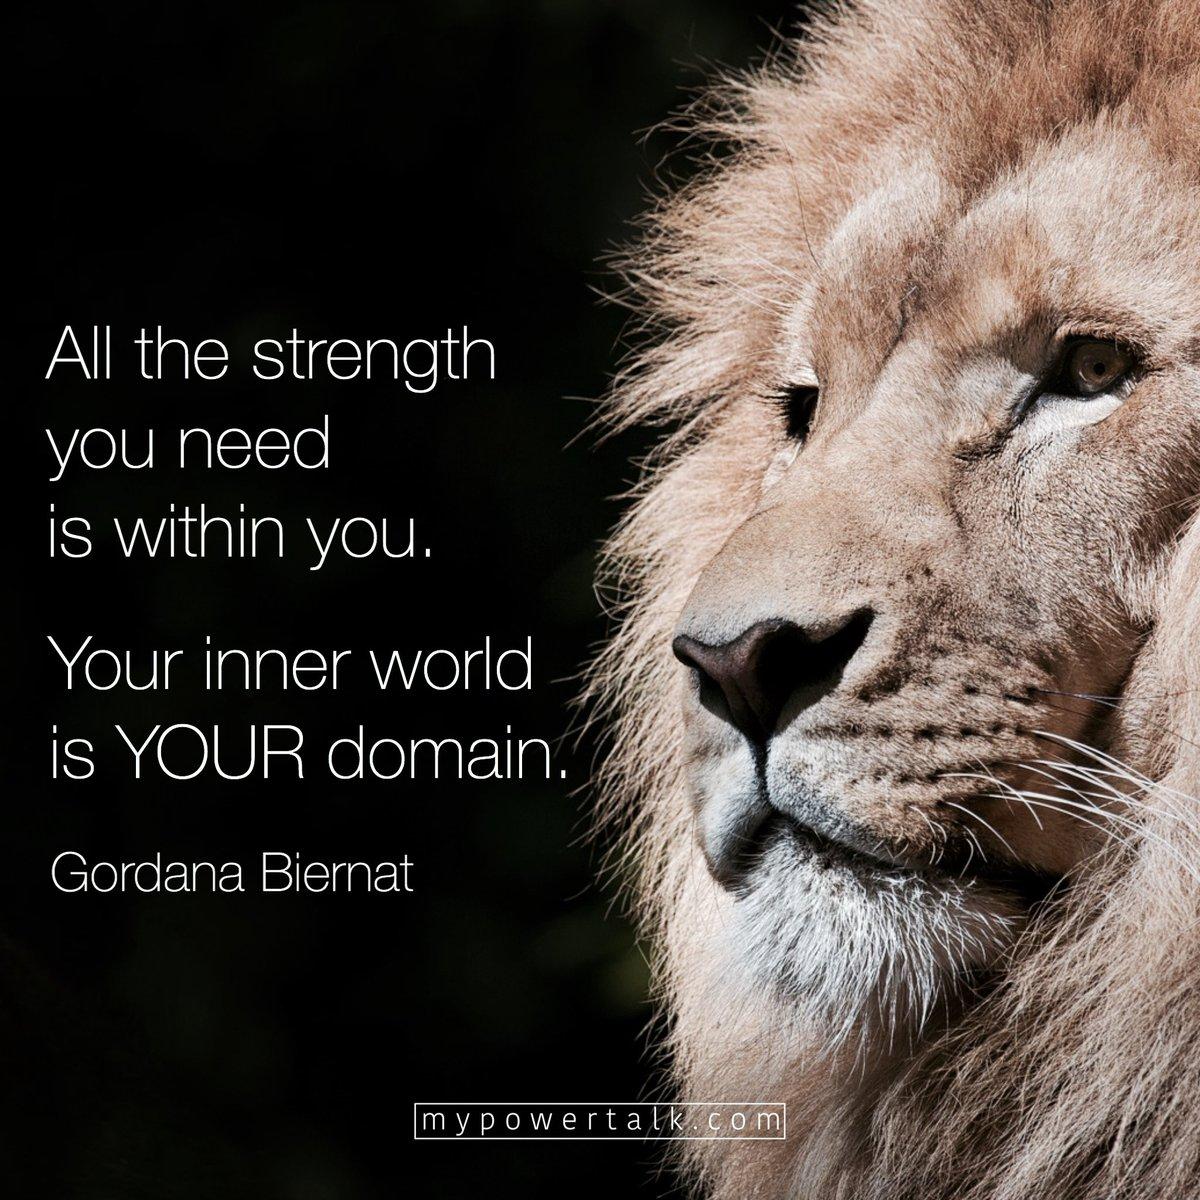 All the #strength you need is #within you  Your #inner #world is YOUR #domain  via @MyPowertalk  #ThinkBIGSundayWithMarsha #InspireThemRetweetTuesday #Life #JoyTrain #IQRTG #Love  #SuperSoulSunday #MondayMotivation #MotivationMonday #TuesdayThoughts #WednesdayWisdom<br>http://pic.twitter.com/PXV6mc02X7